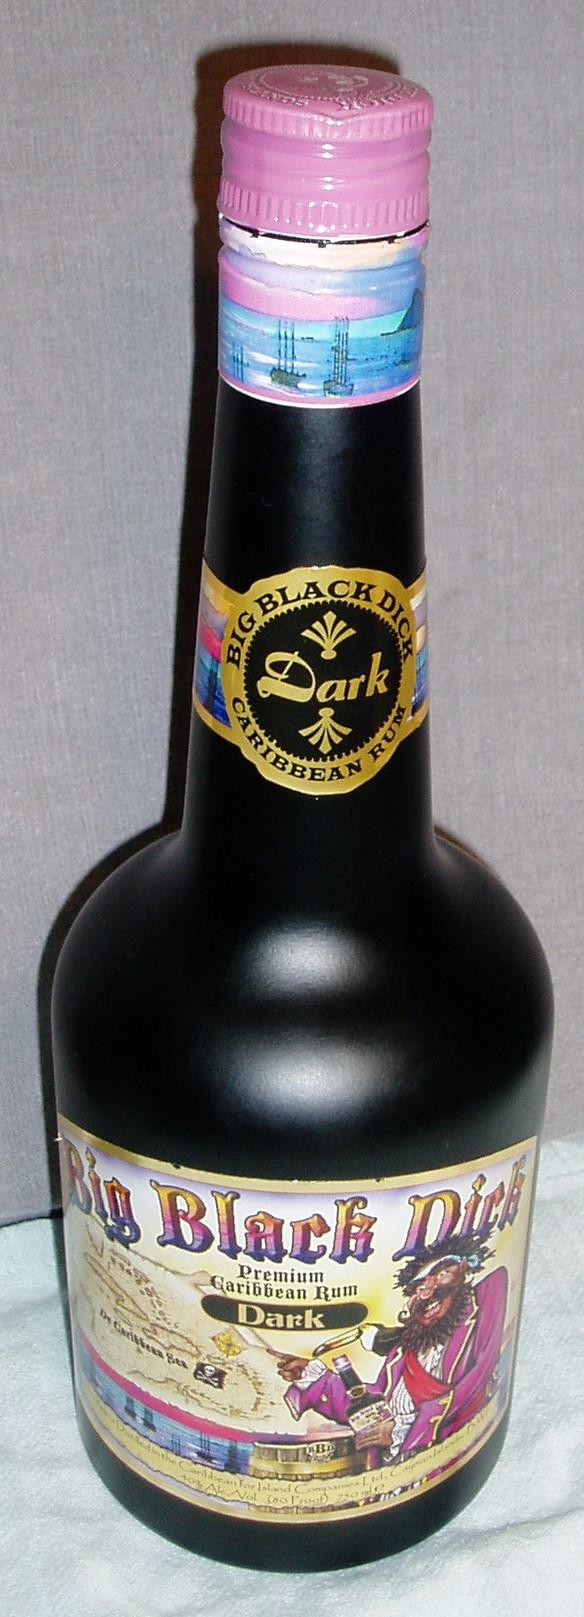 Big black dick alcohol